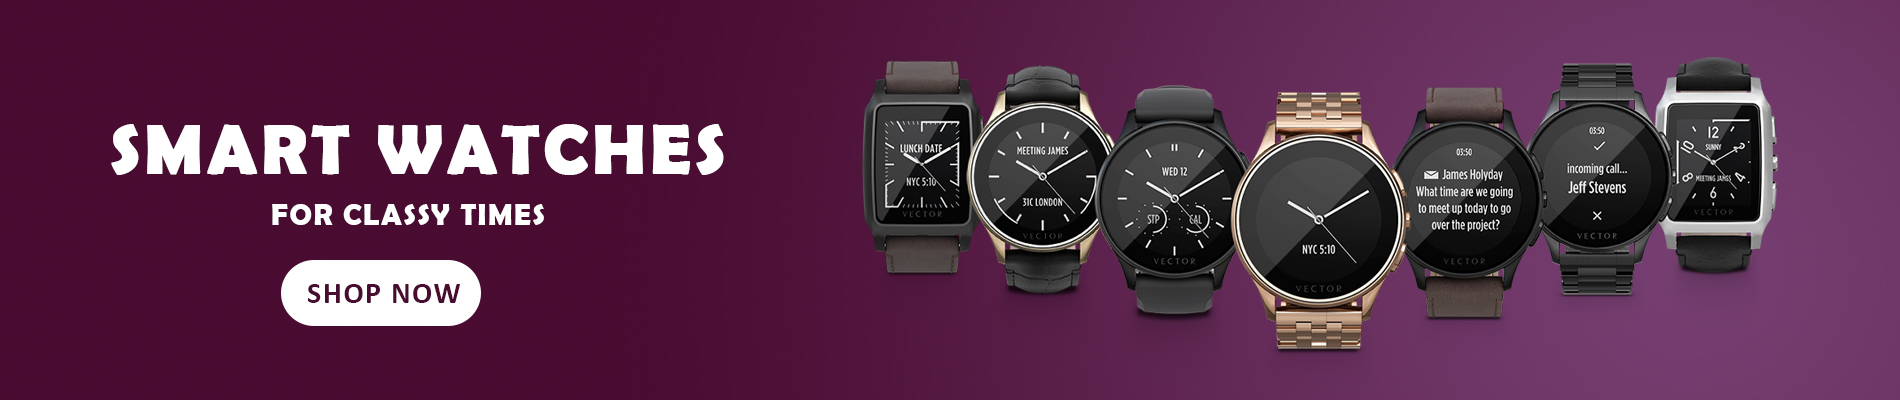 Watches, Smart Watches & Accessories